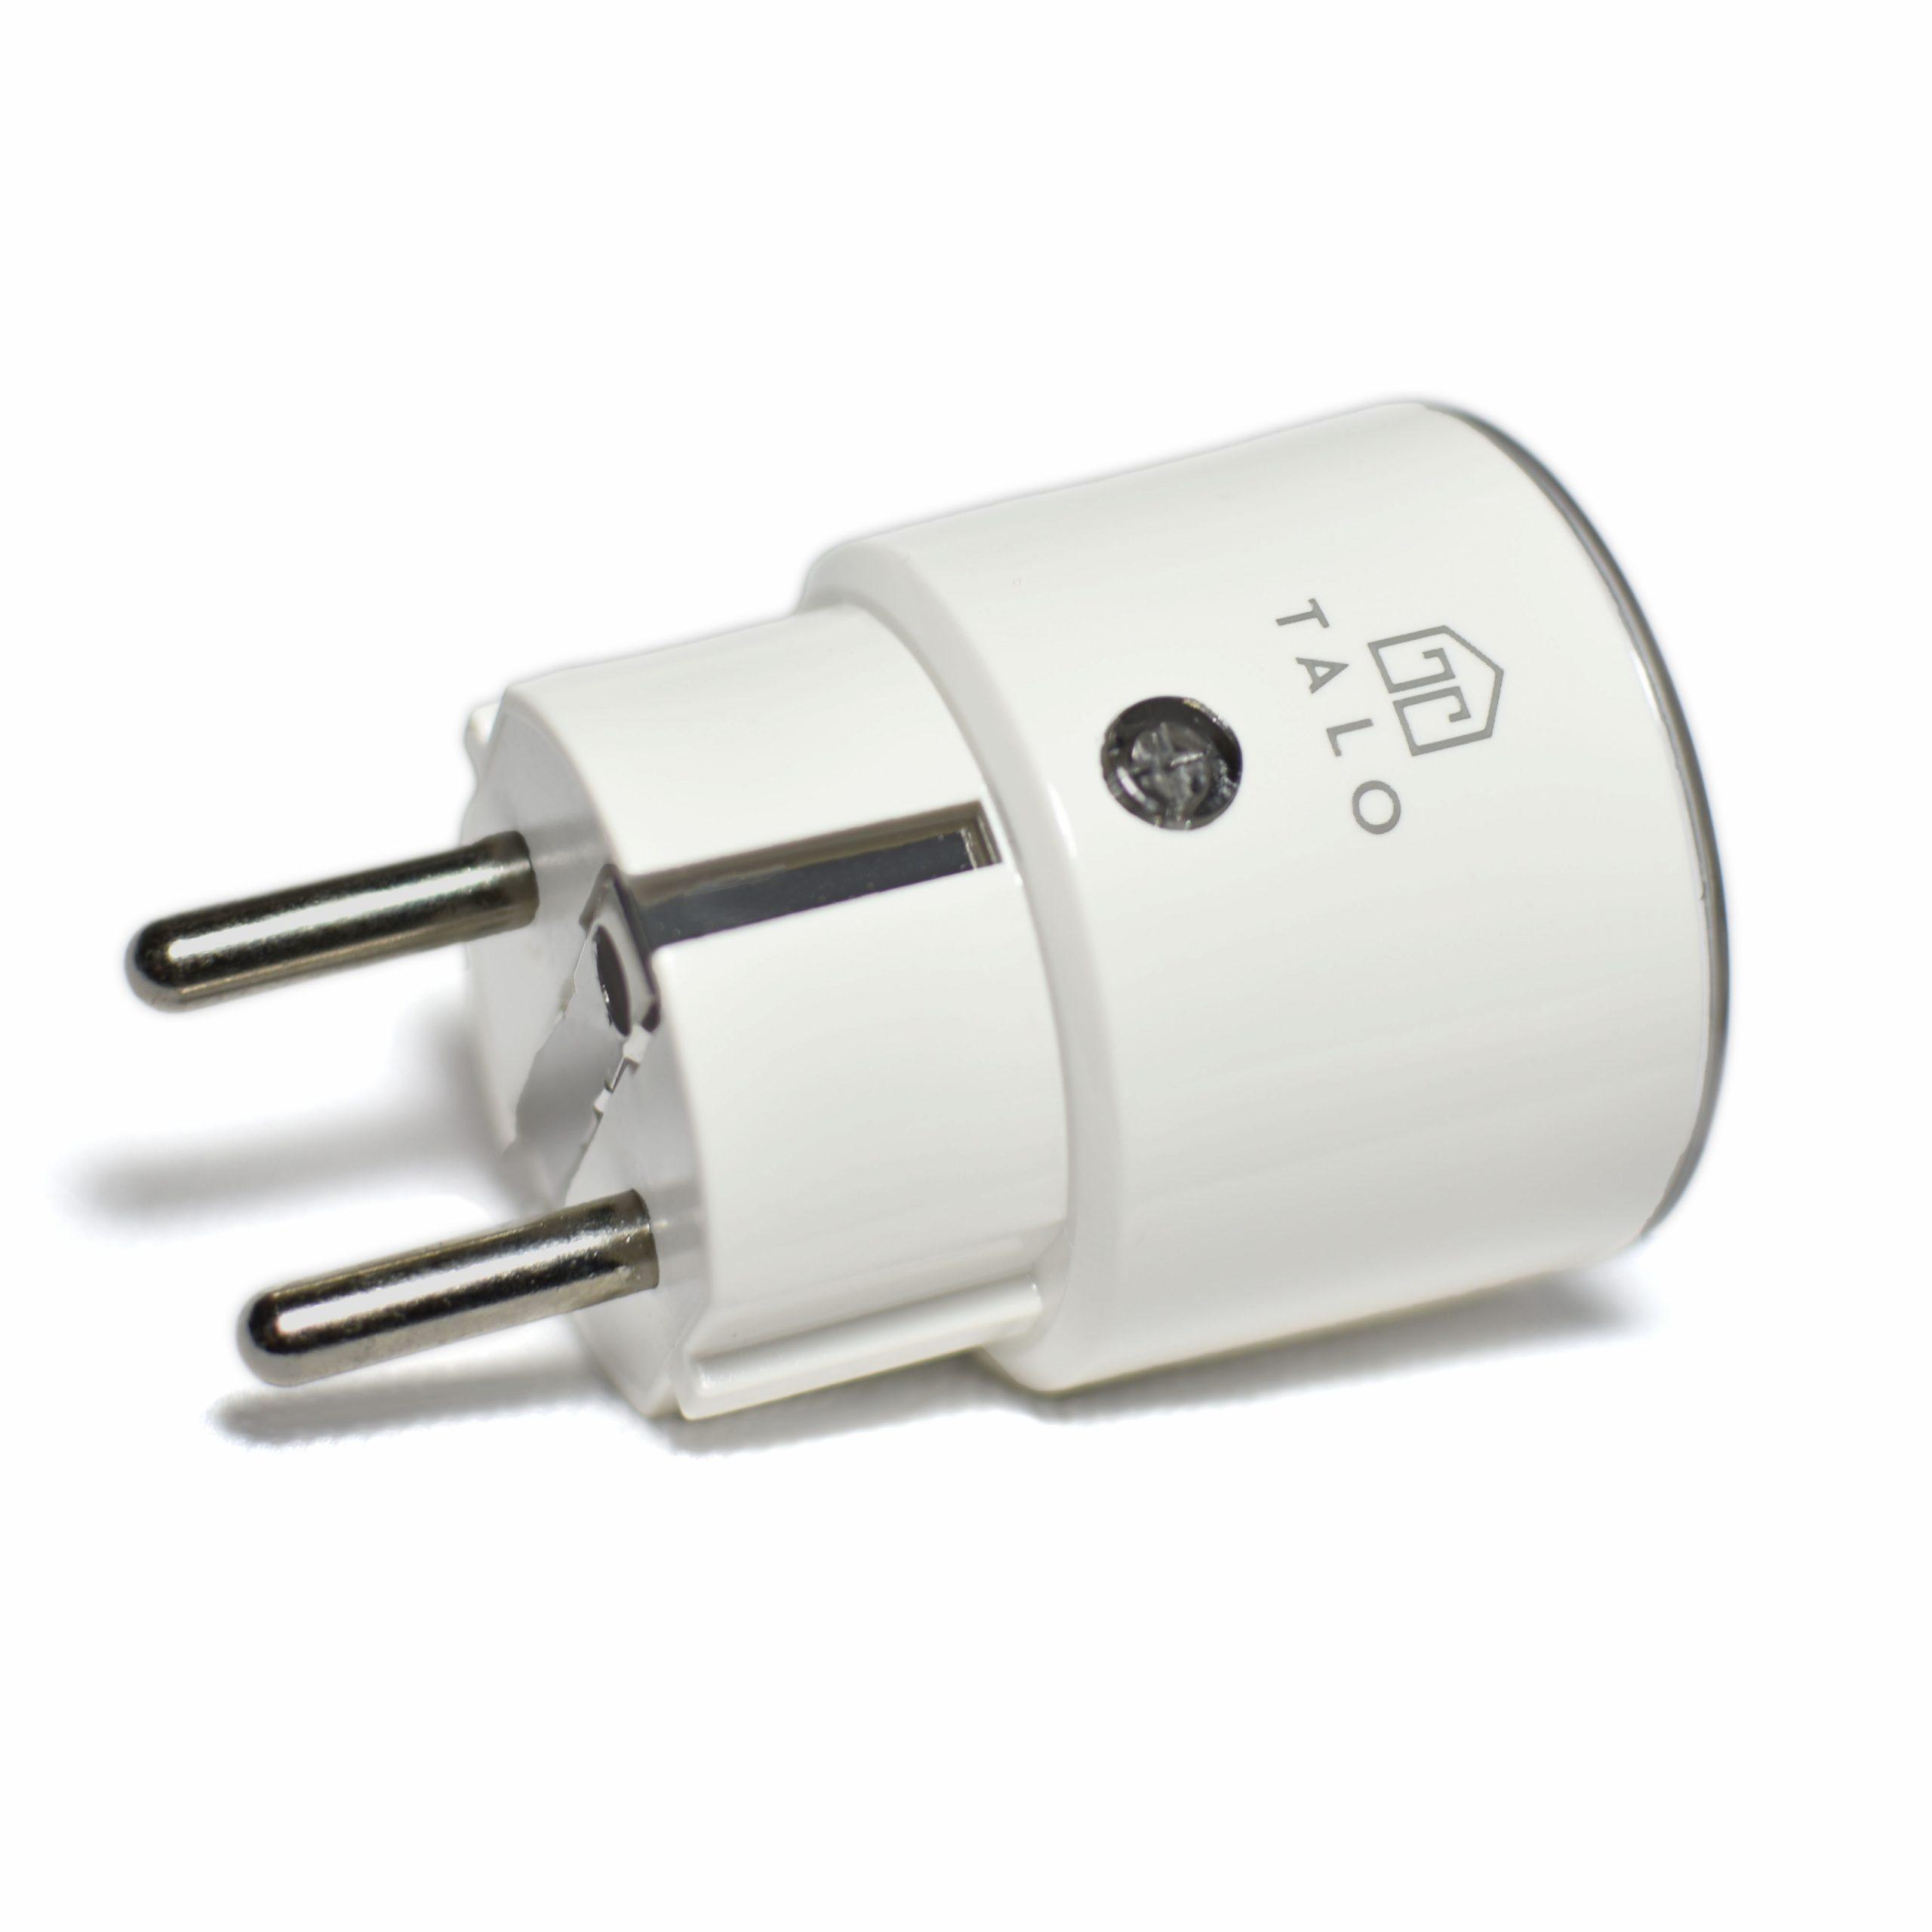 Talo Smart Plug